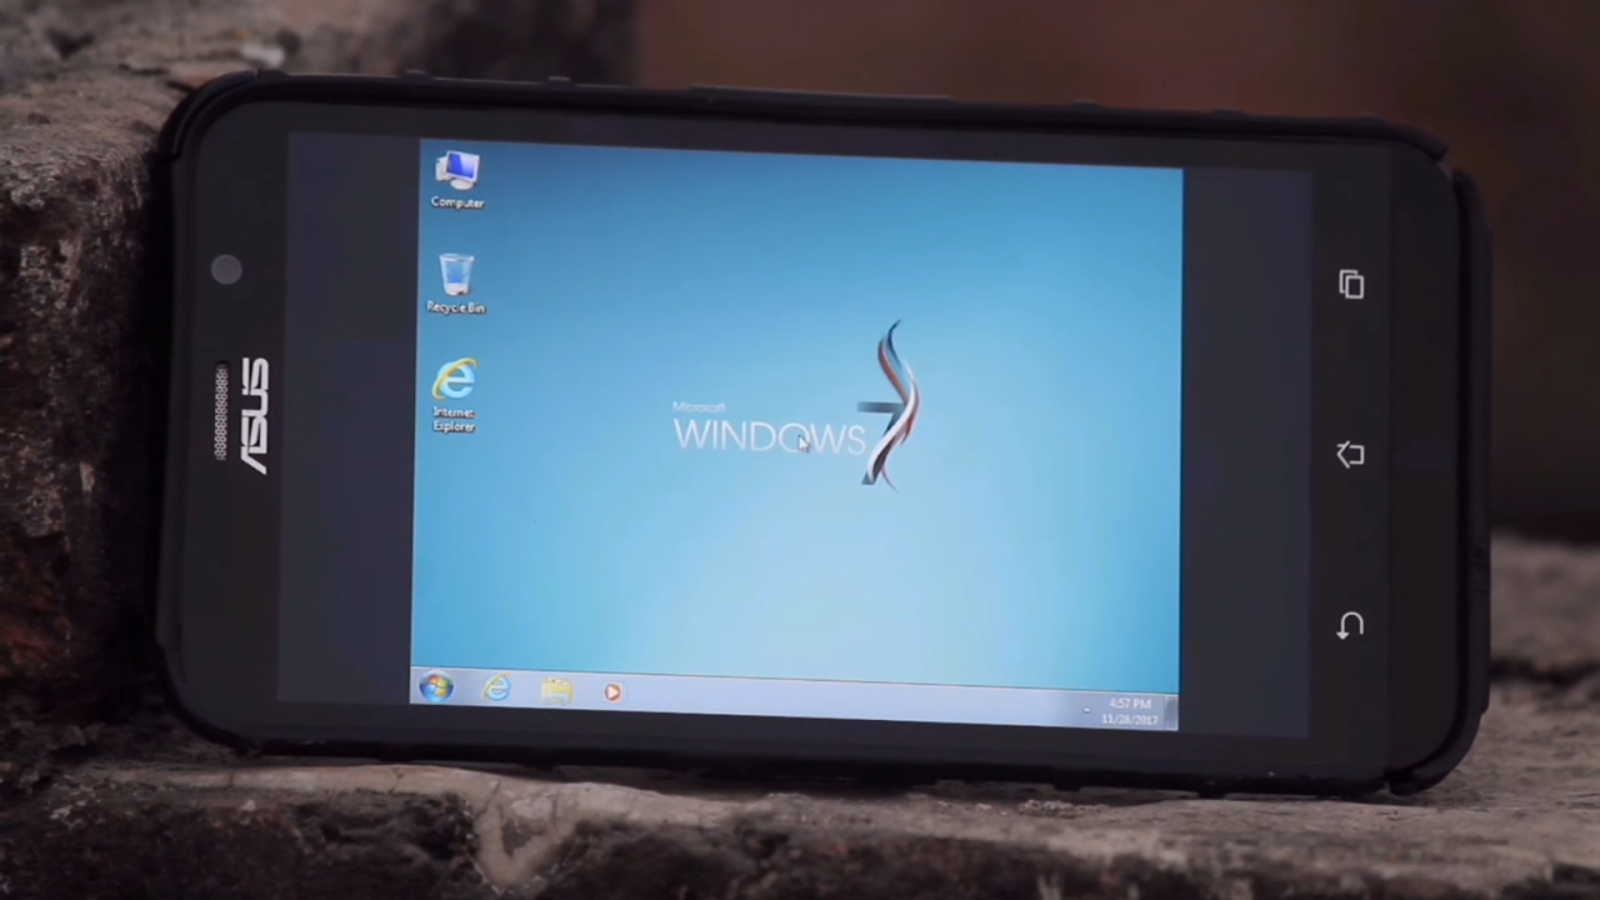 windows 7 img file for limbo